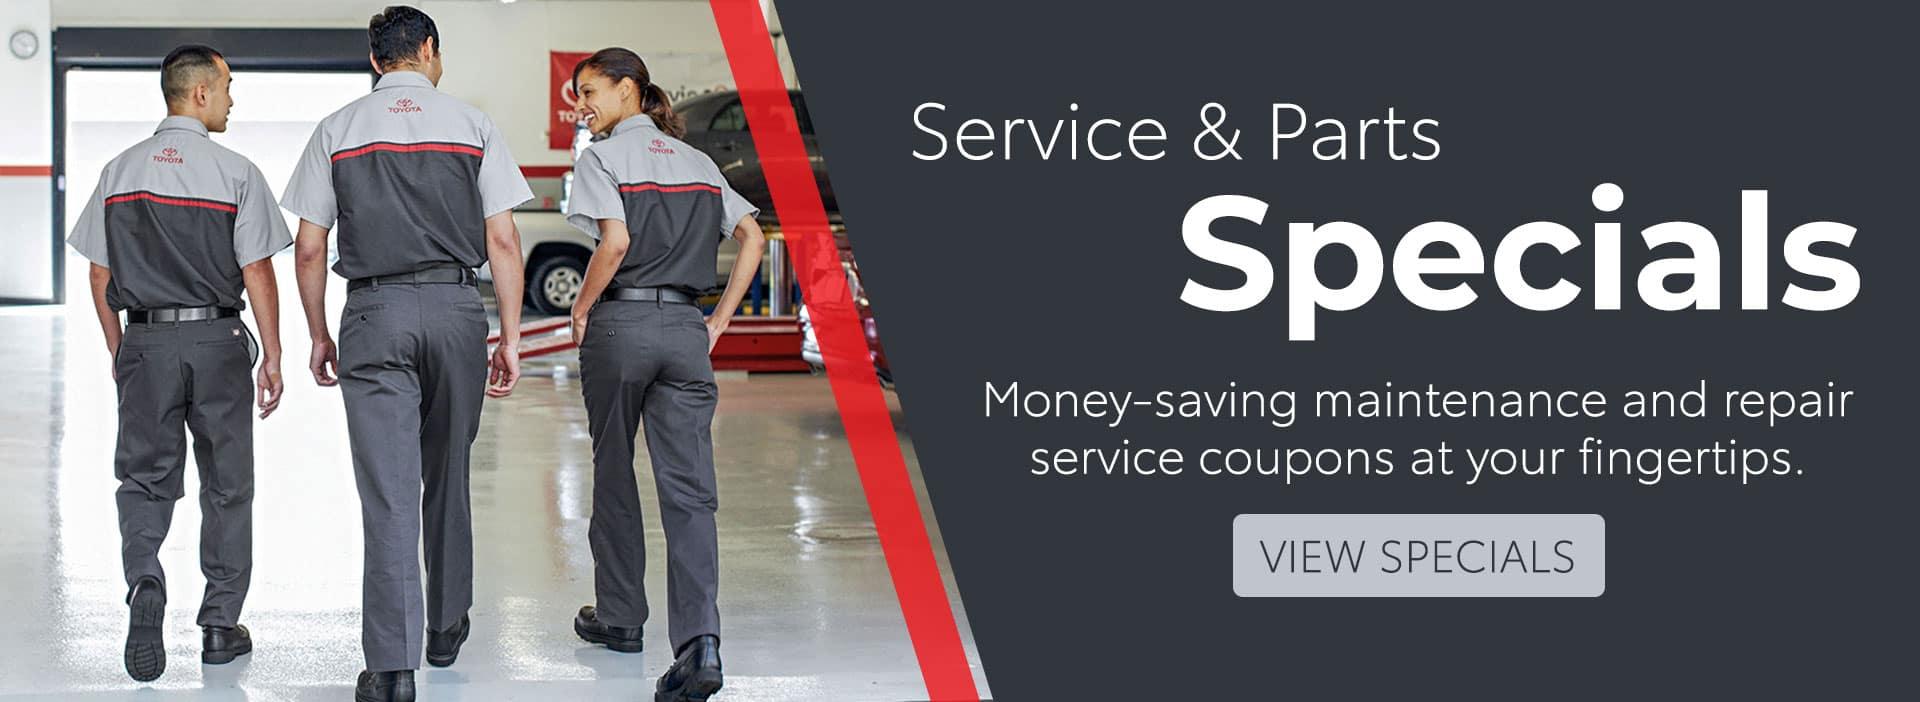 Toyota Service & Parts Specials